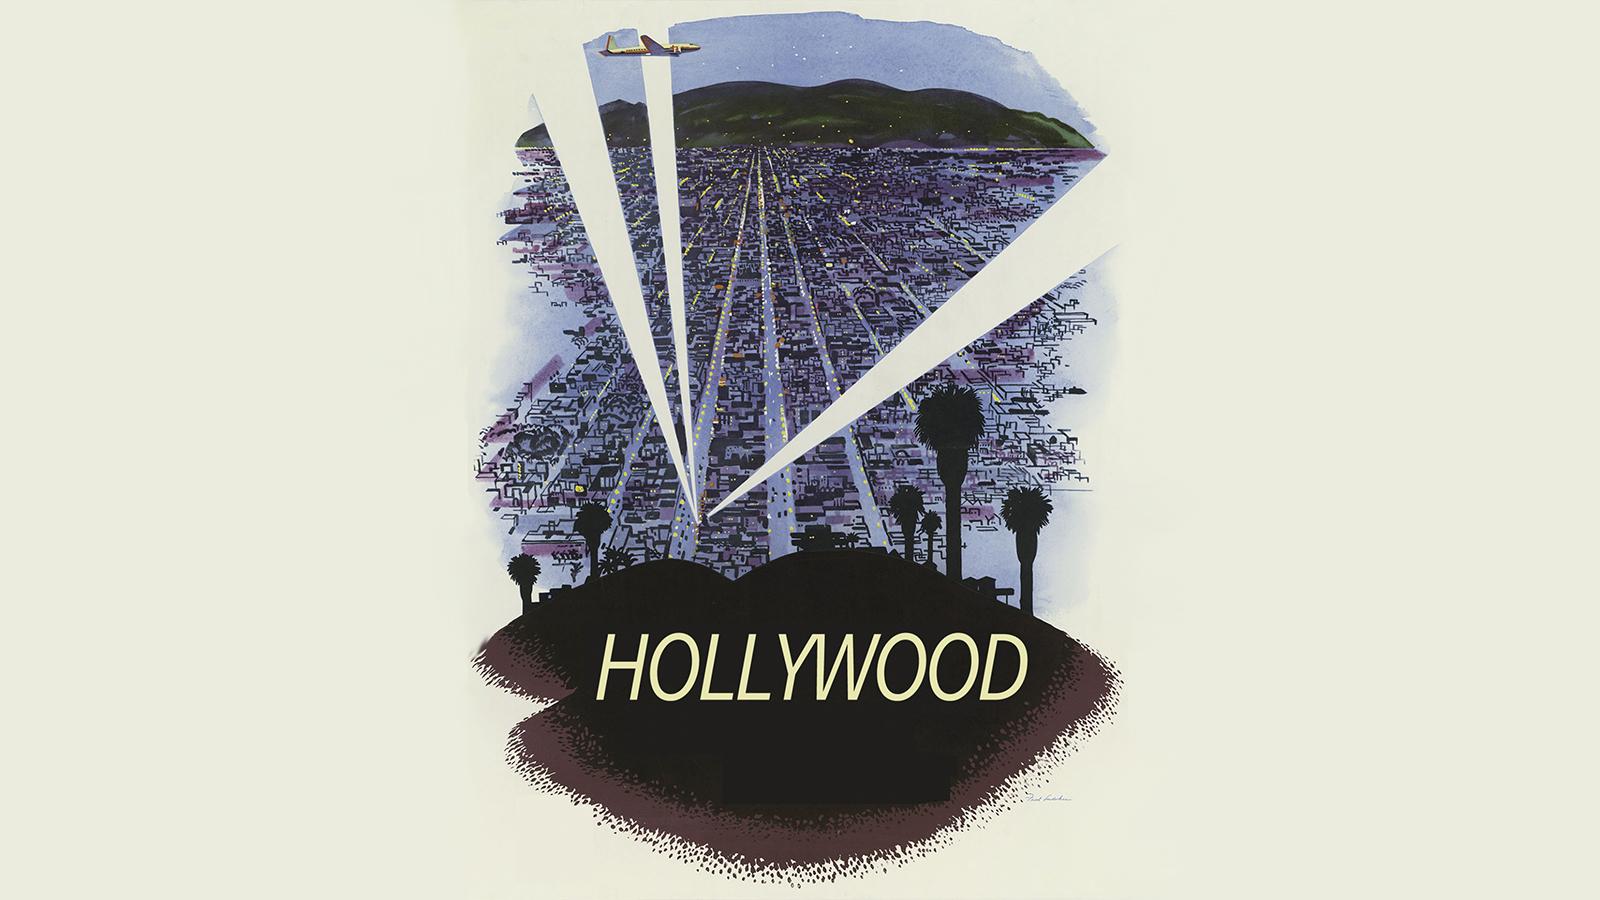 [Program Eleven:Hollywood Babylon: No Escape] Vintage Hollywood poster by Circe Denyer; Creative Commons